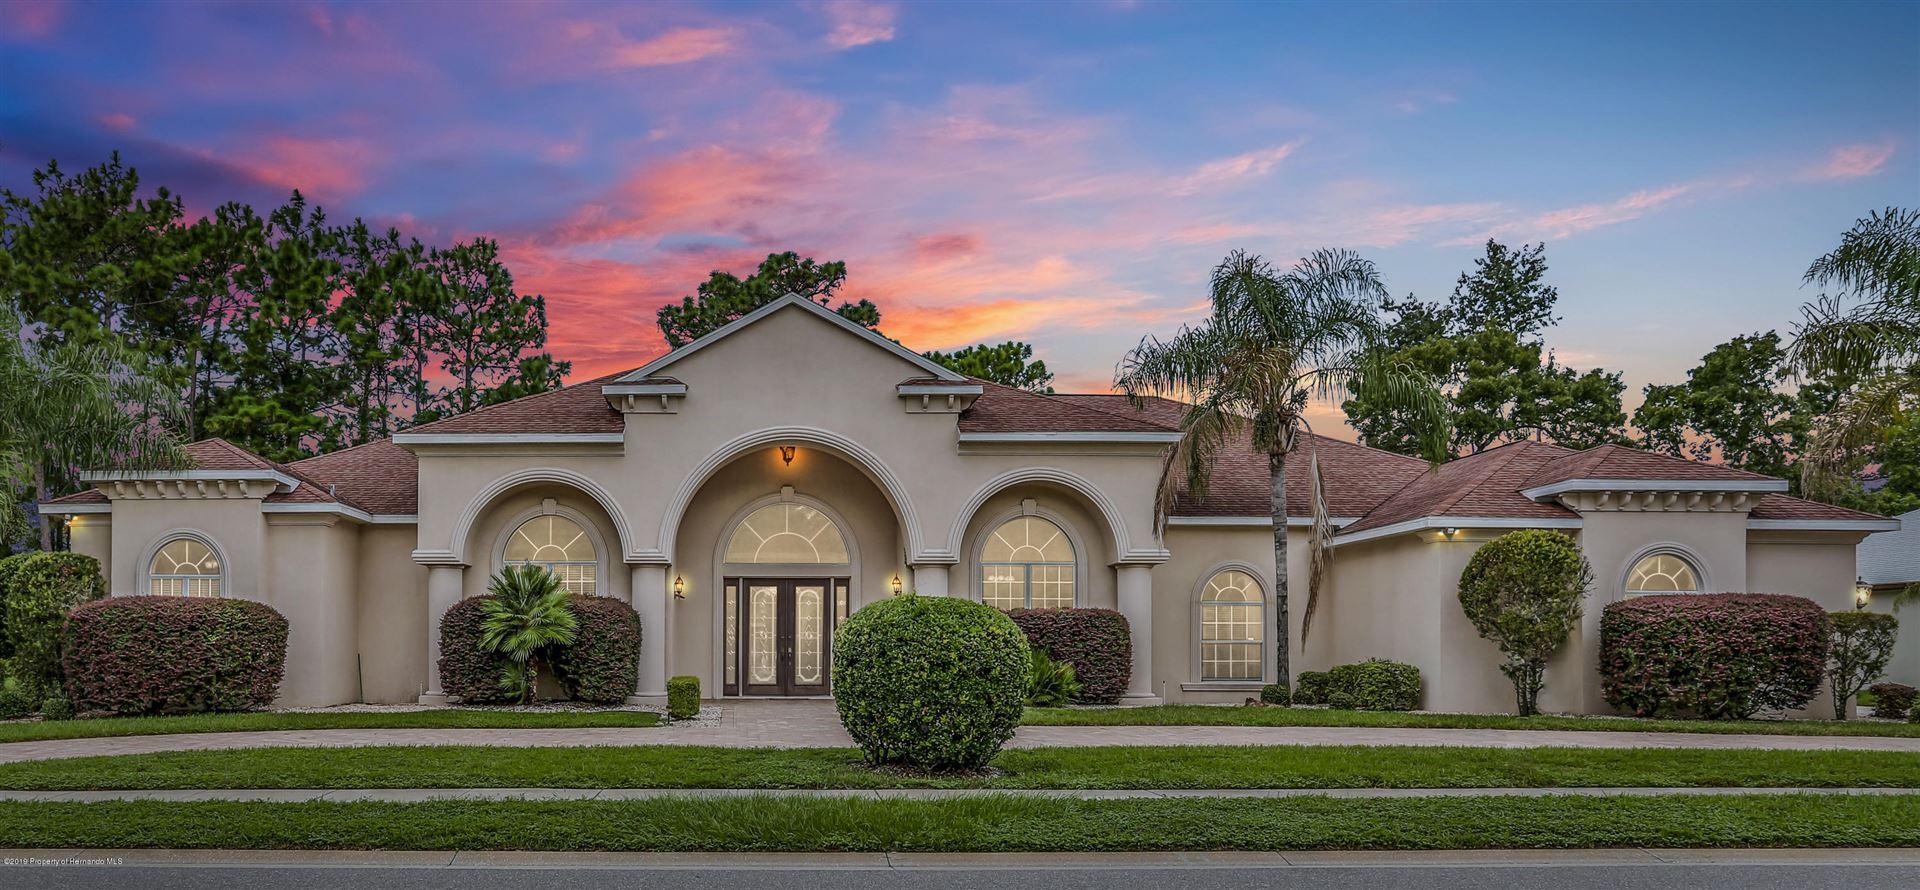 5275 Legend Hills Lane, Spring Hill, FL 34609 - MLS#: 2207604